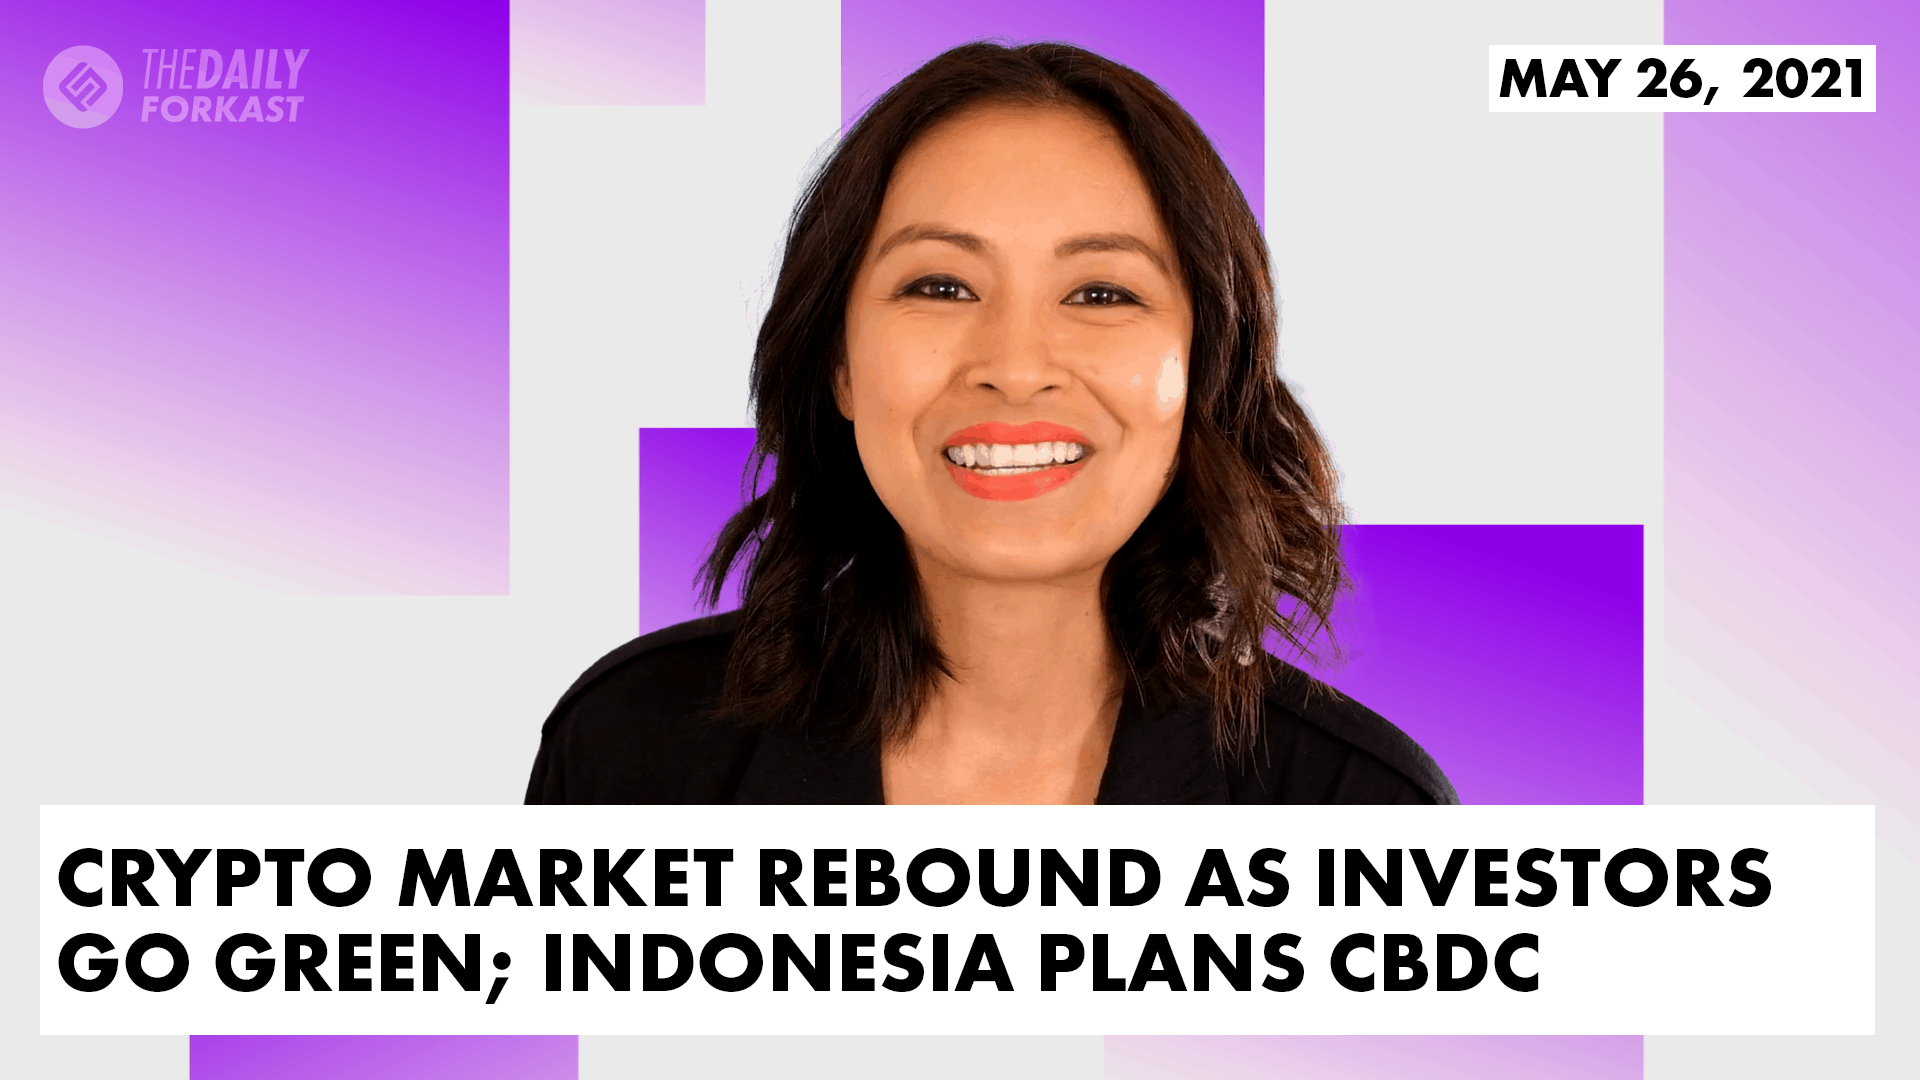 Crypto market rebound as investors go green Indonesia plans CBDC